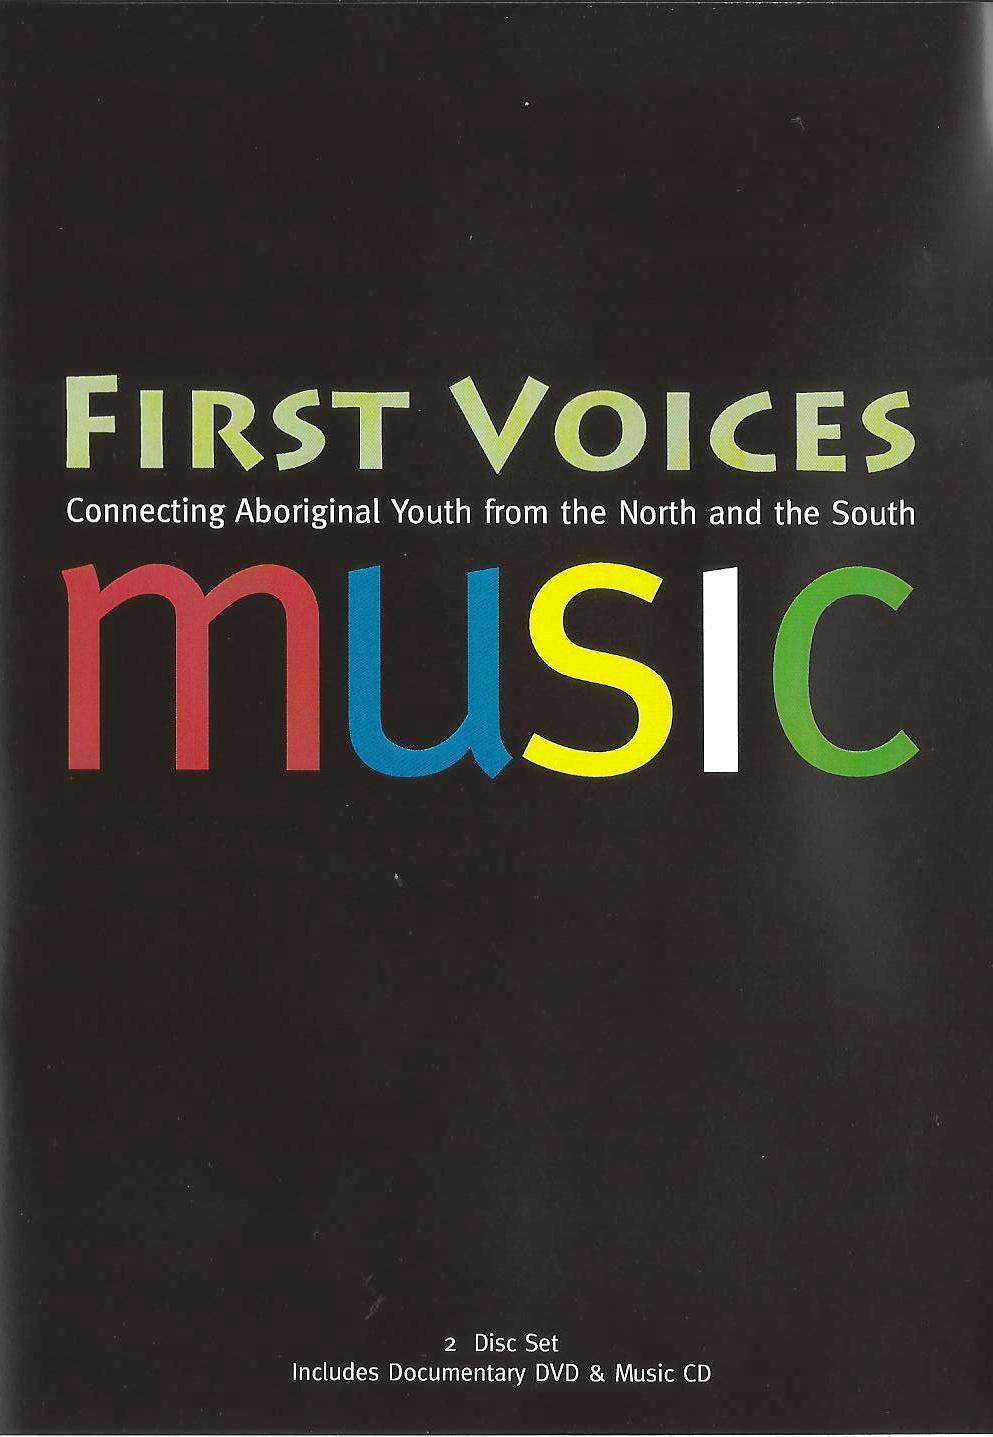 FirstVoiceMusicDVD.jpg